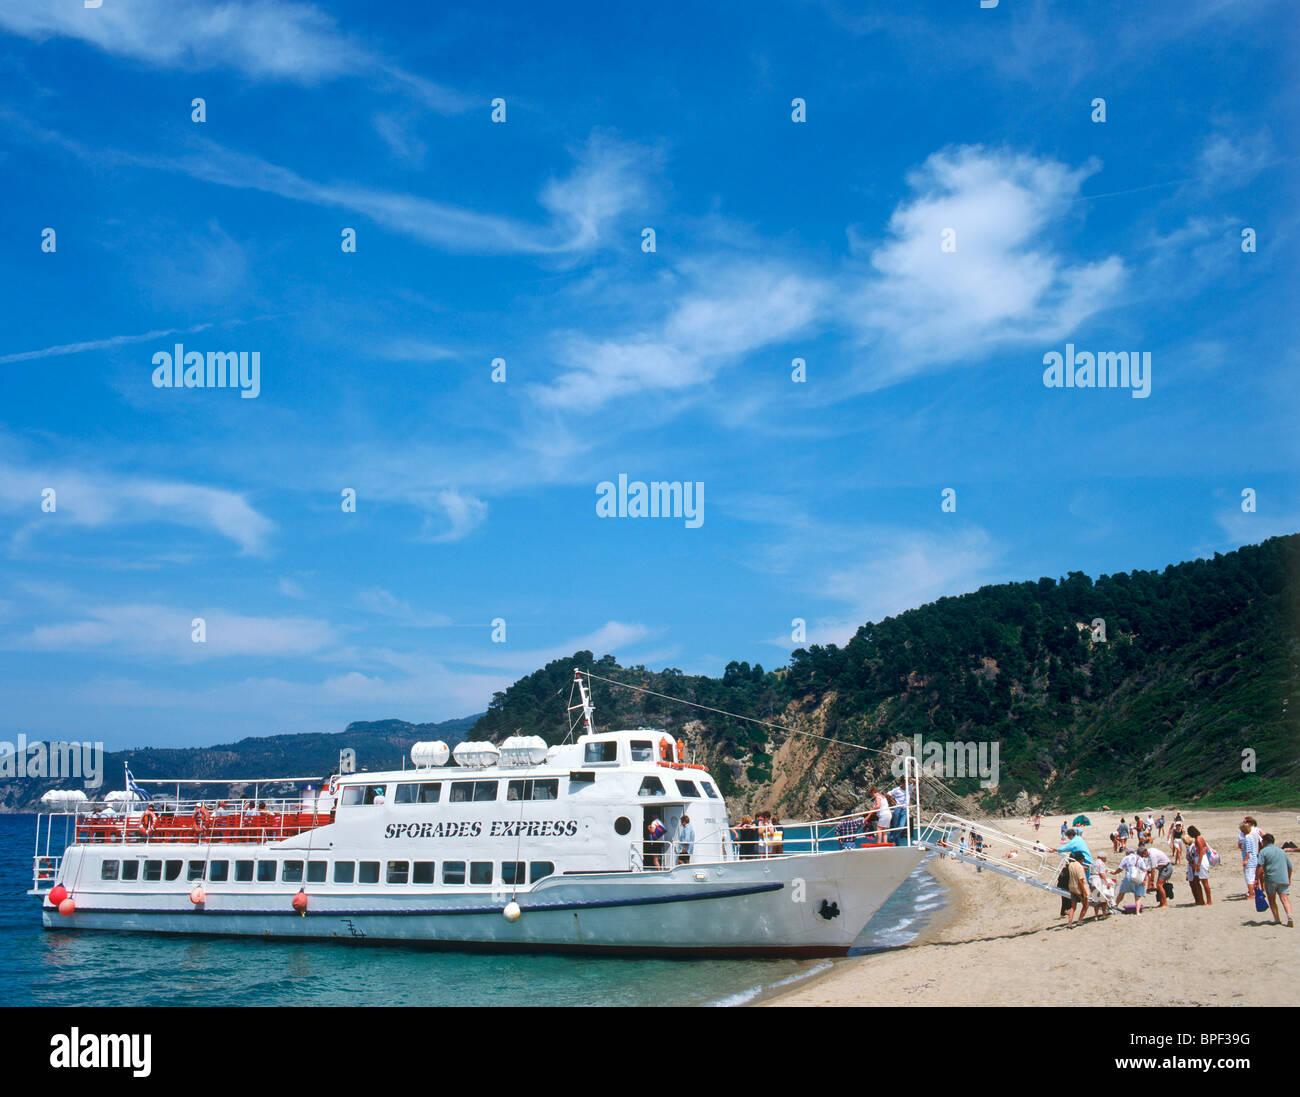 Excursion Boat on Asselinos Beach, Skiathos, Sporades Islands, Greece - Stock Image